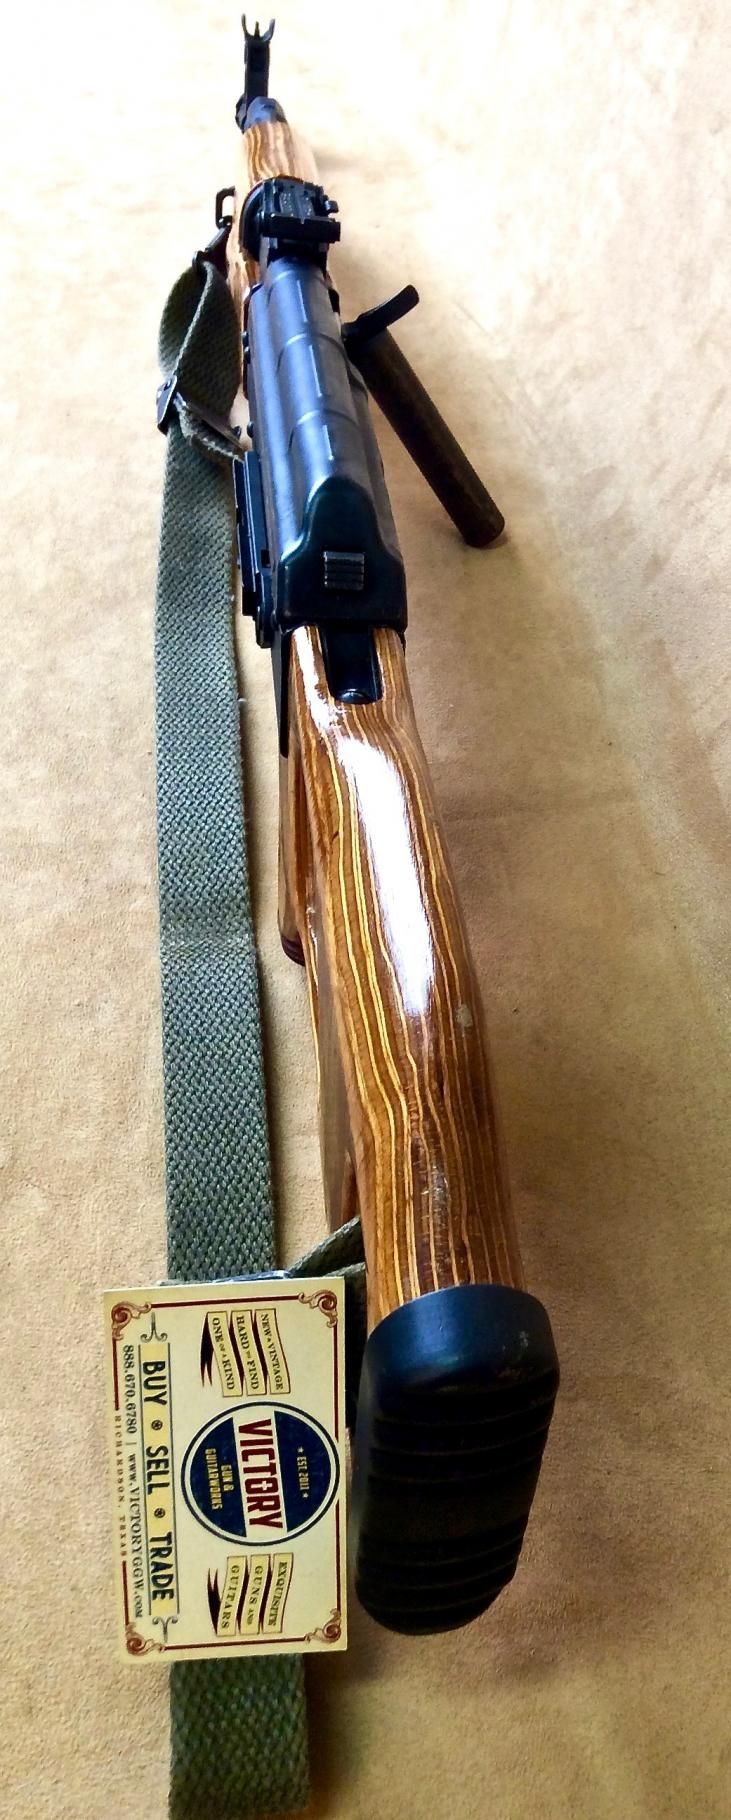 Very Nice Intrac Ratmil CUR2 AK-74 5.45x39 4 Mags   Victory Guns & Guitar Works, LLC